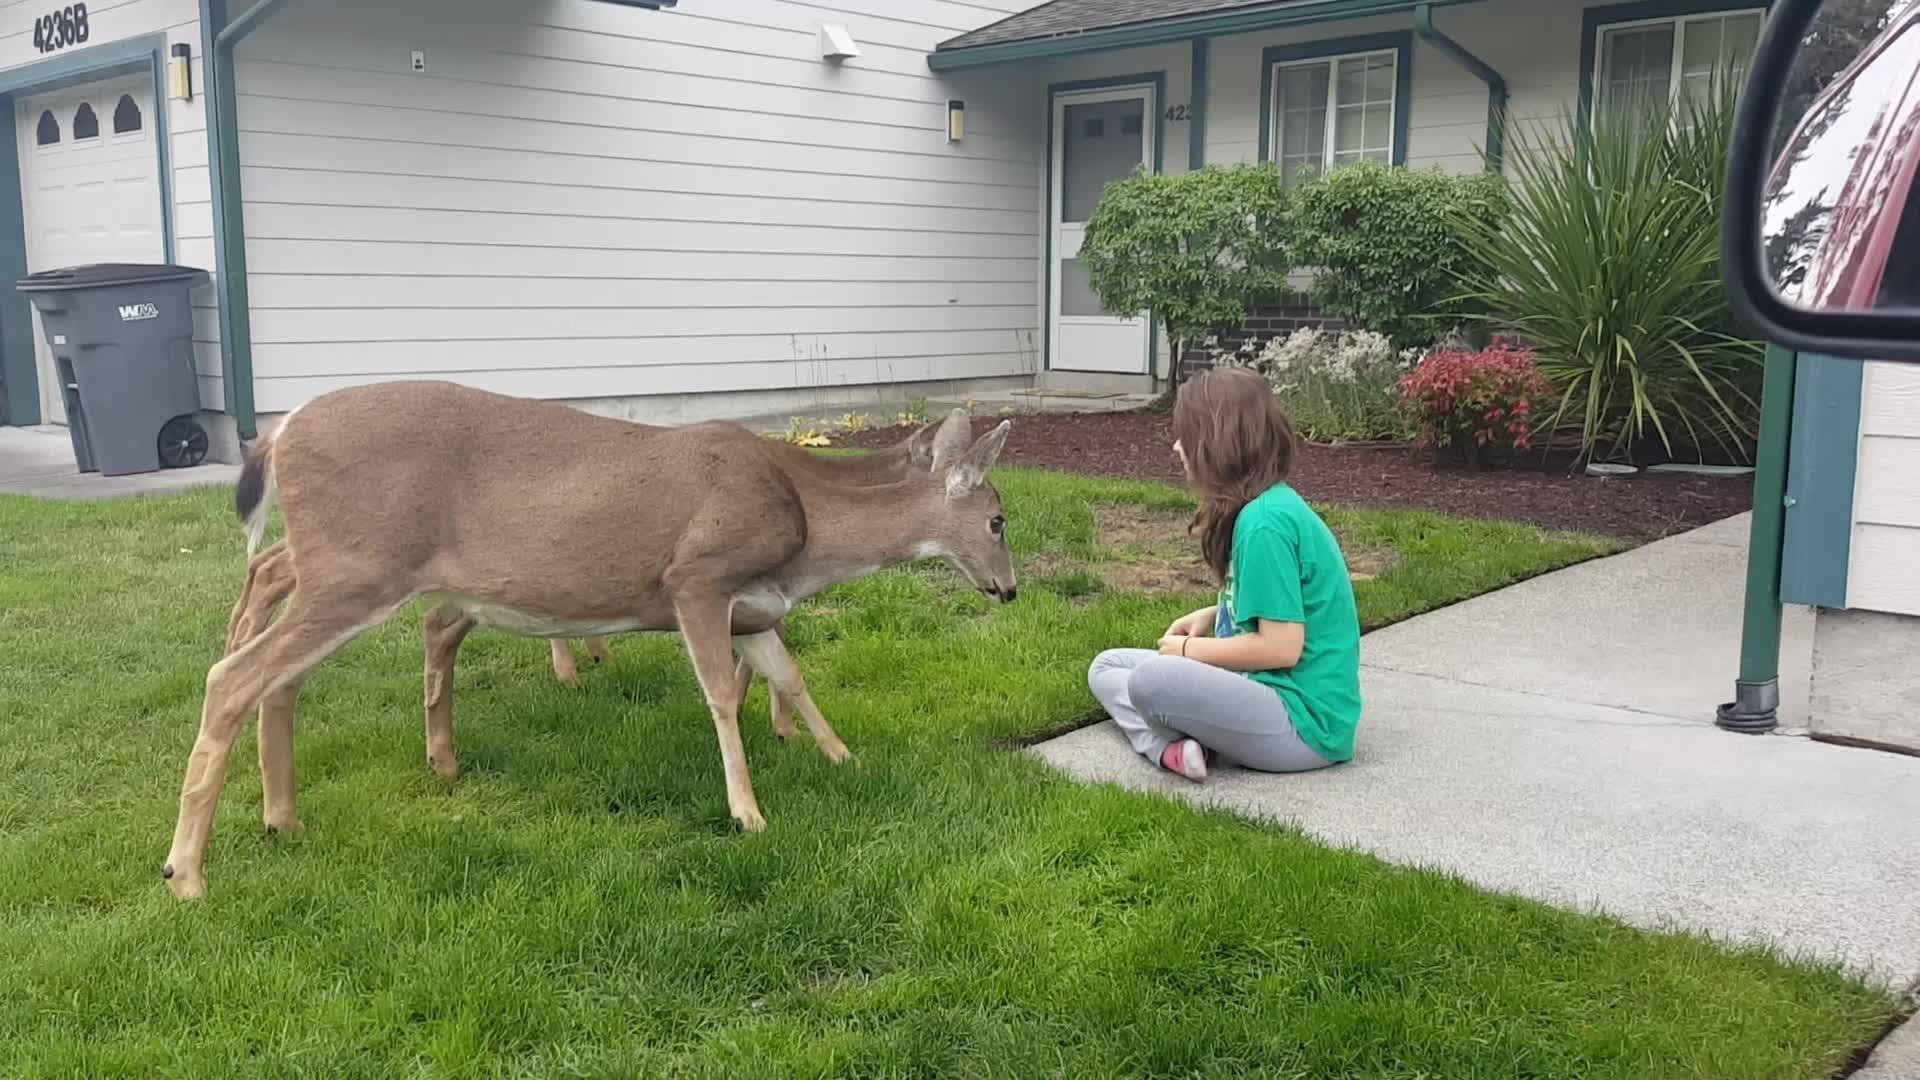 people pet a deer through a fence jukin media